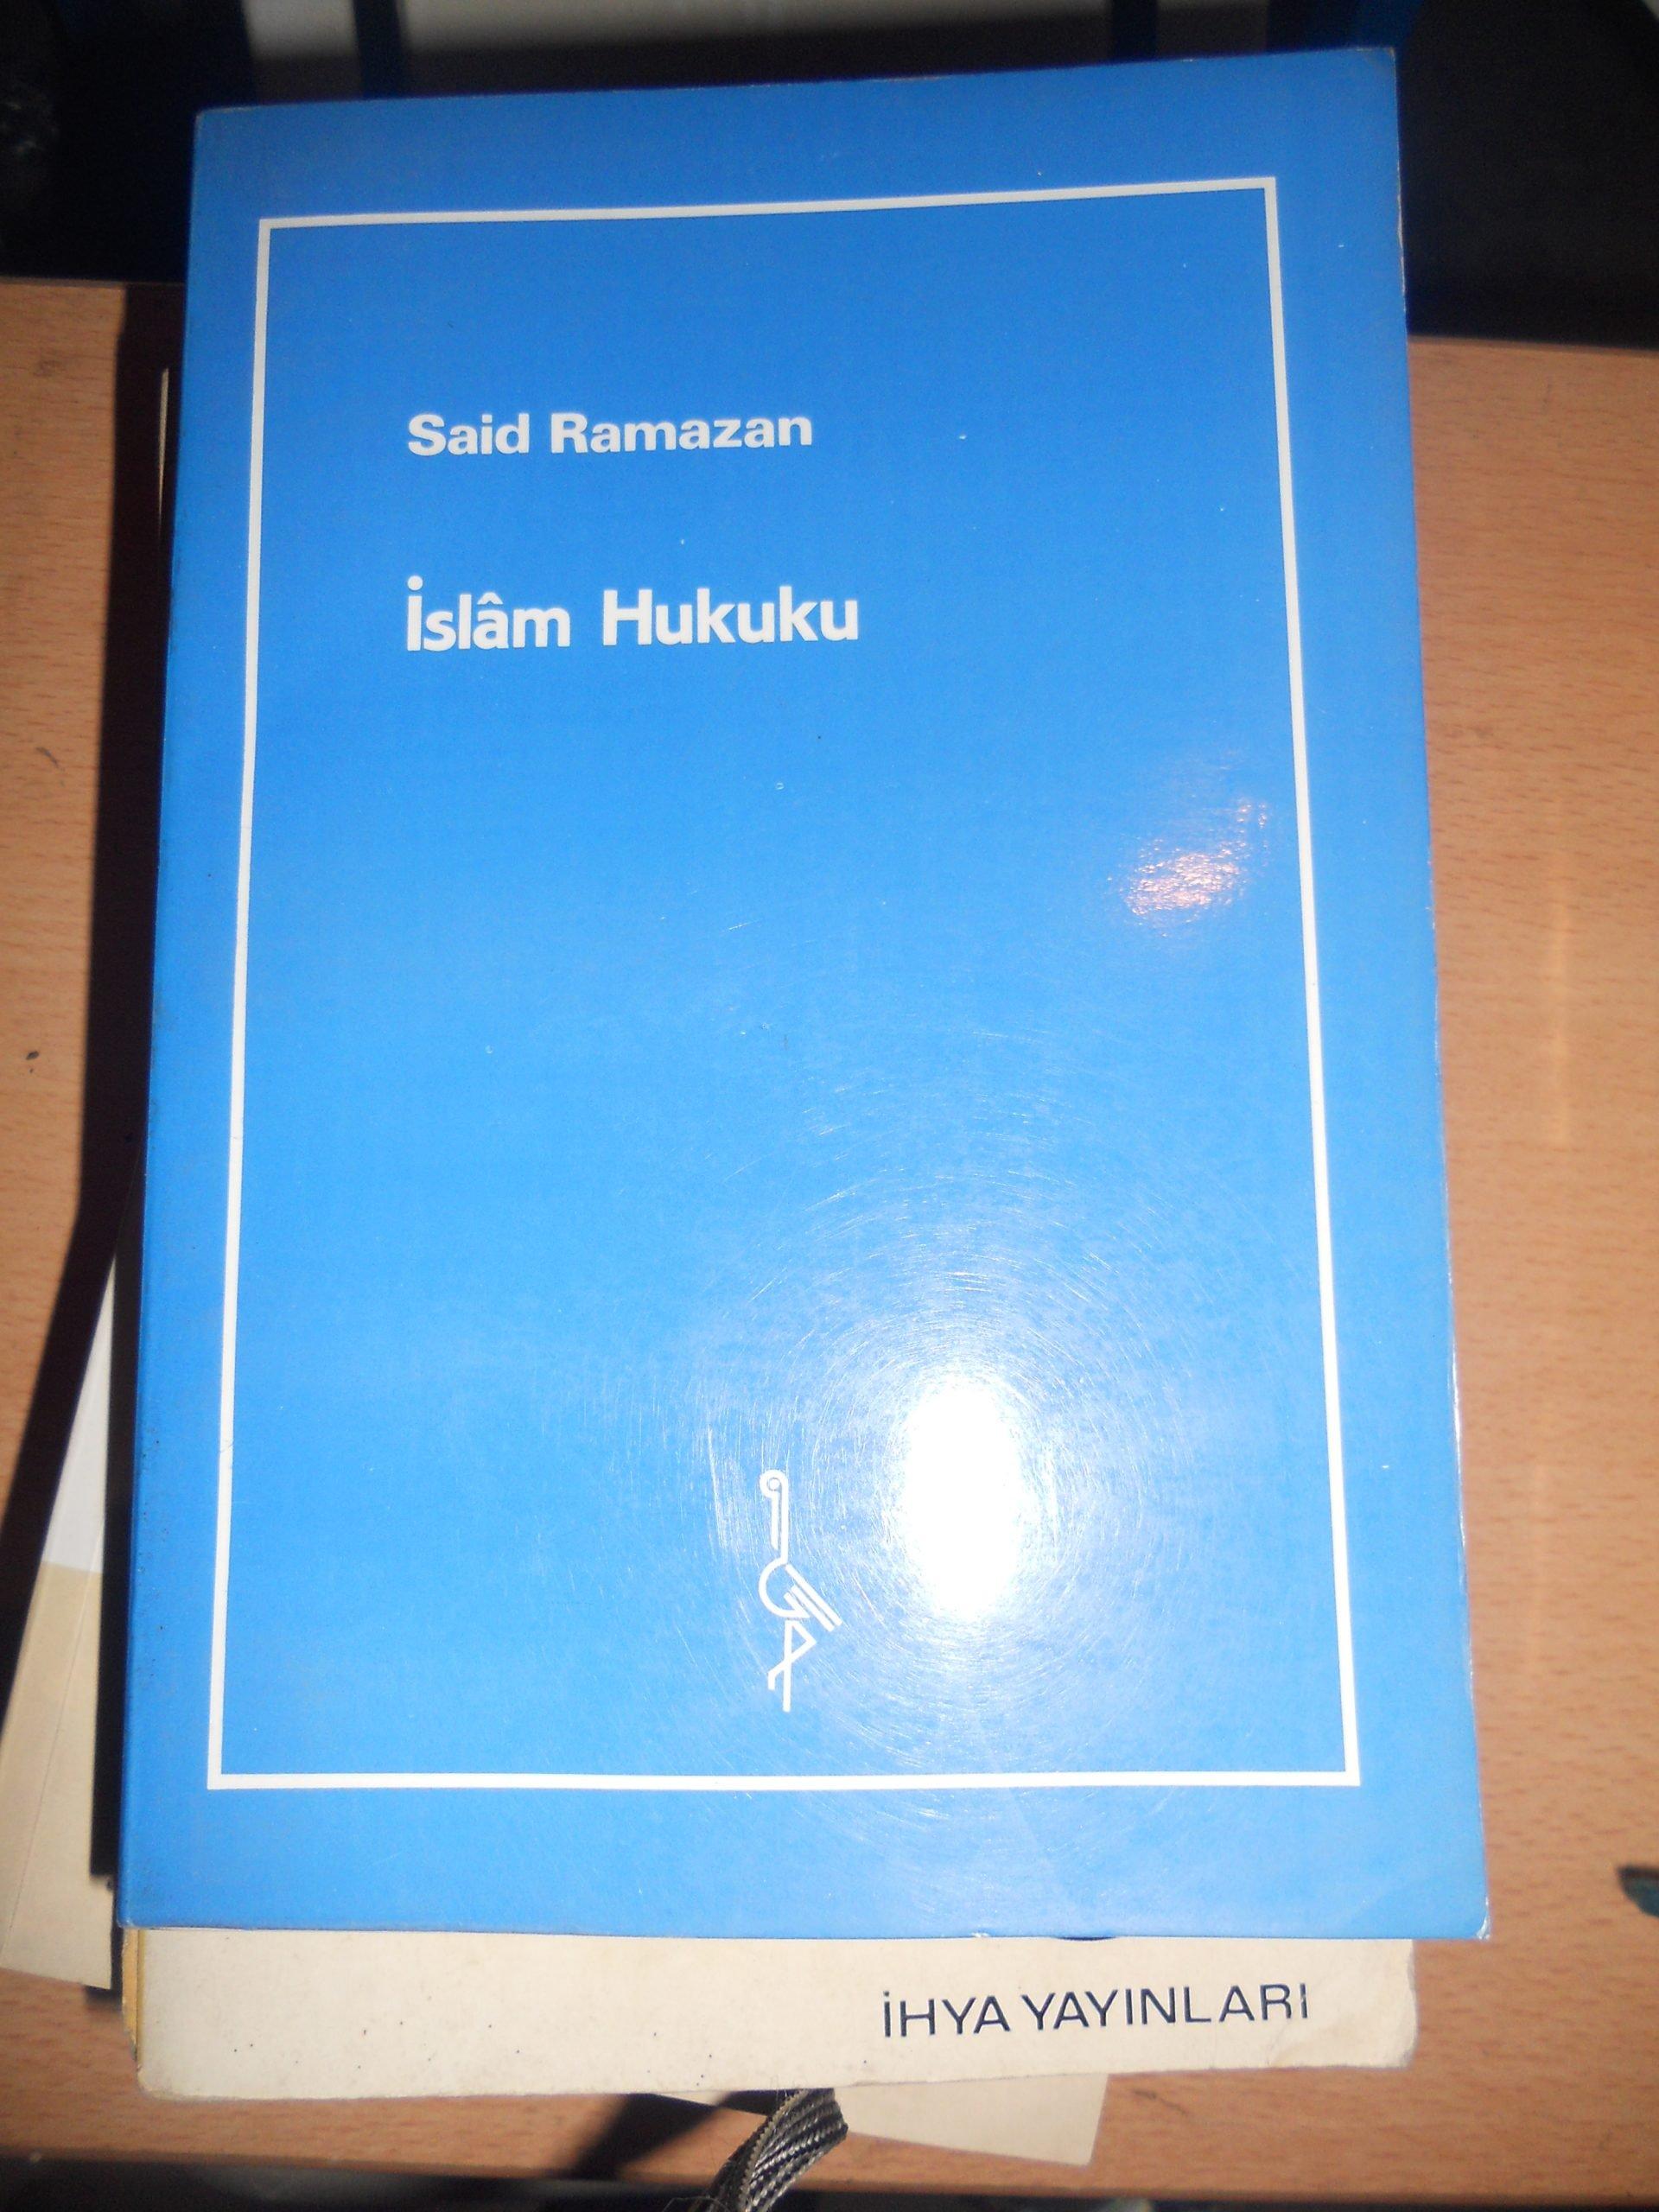 İSLAM HUKUKU/Said Ramazan/ 15 tl